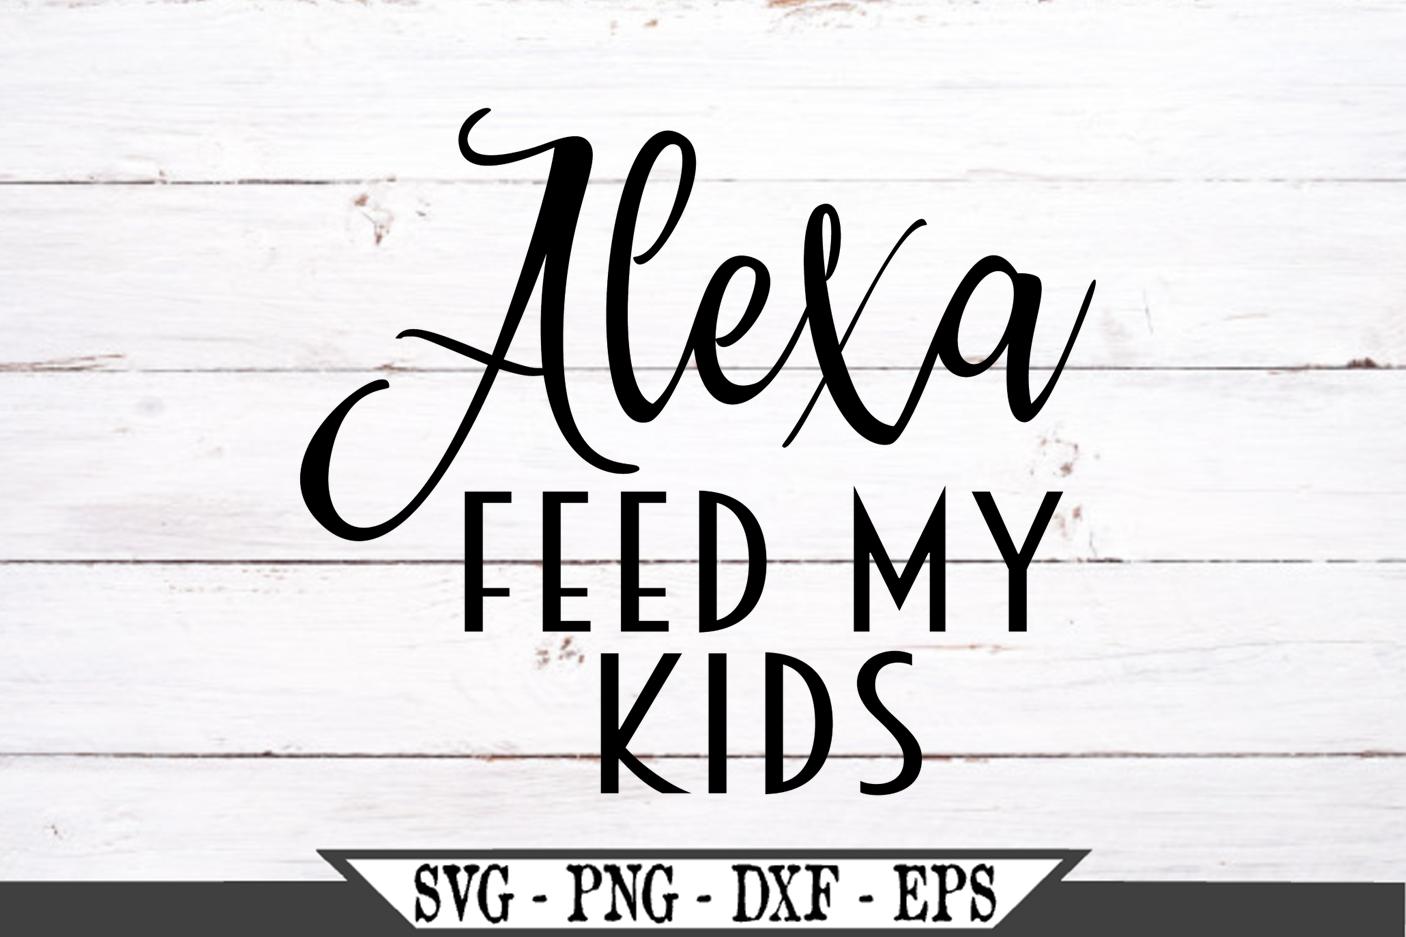 Alexa Feed My Kids SVG example image 2